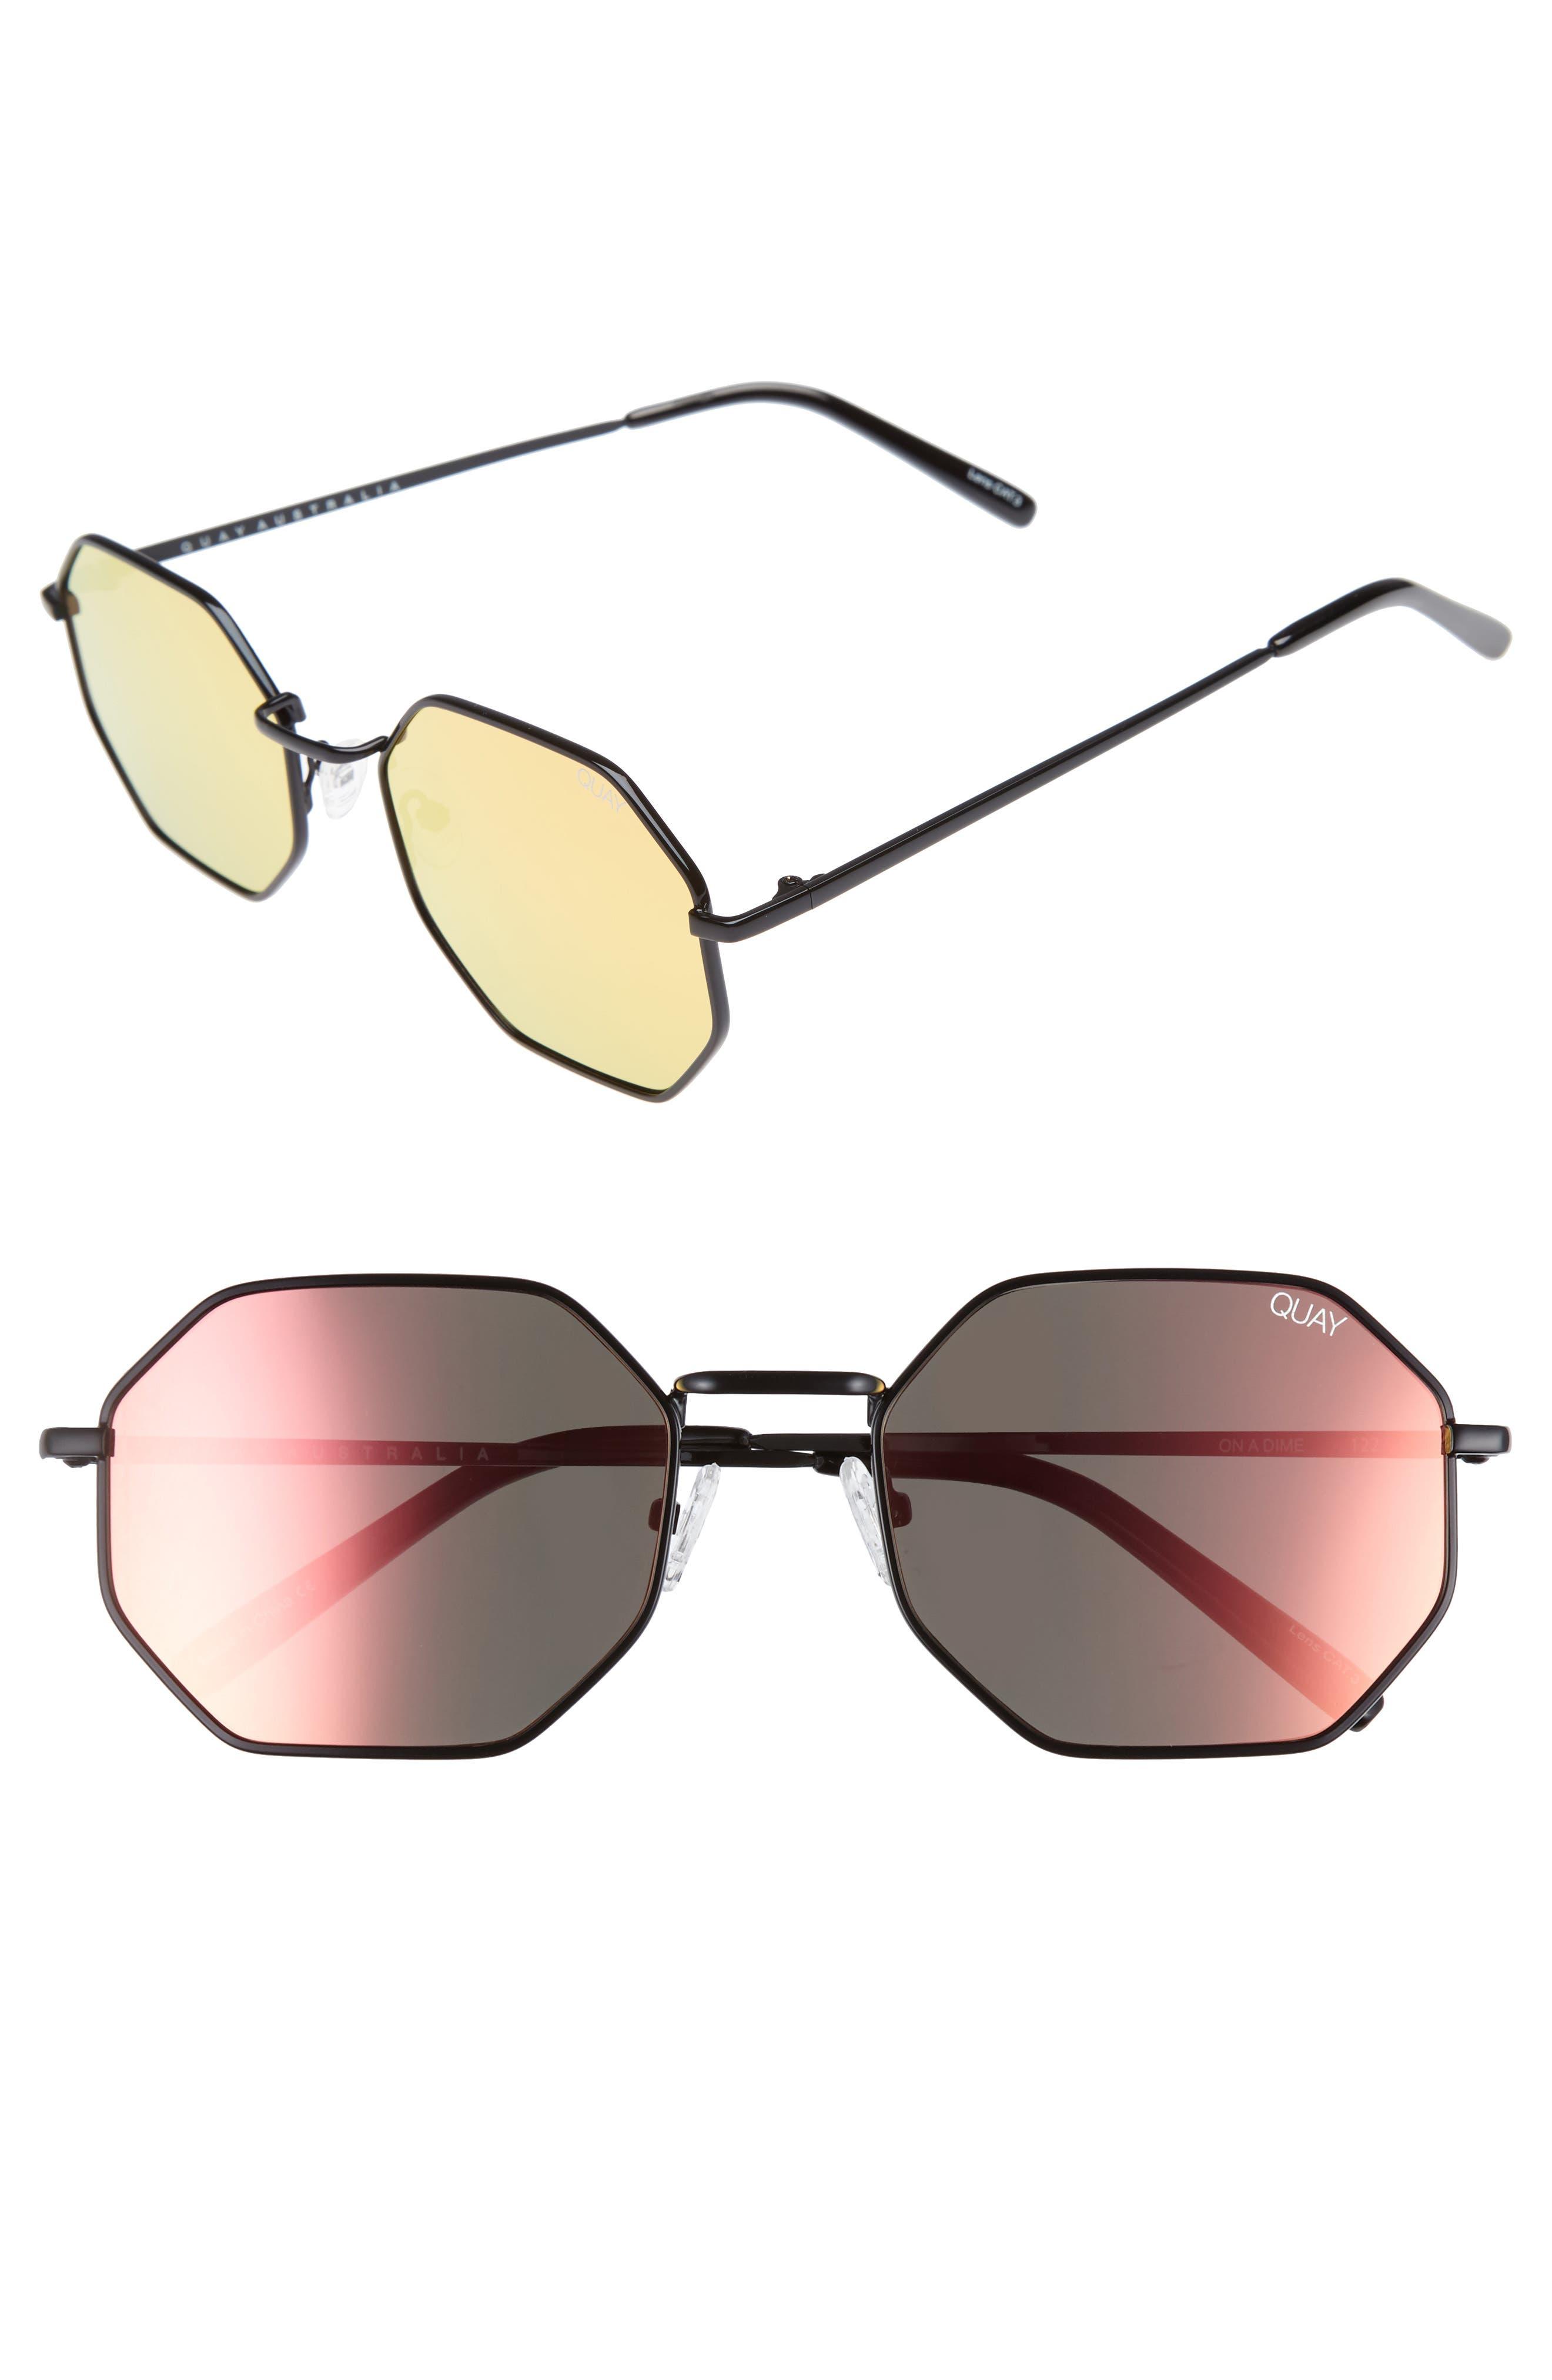 Quay Australia On a Dime 56mm Mirrored Aviator Sunglasses